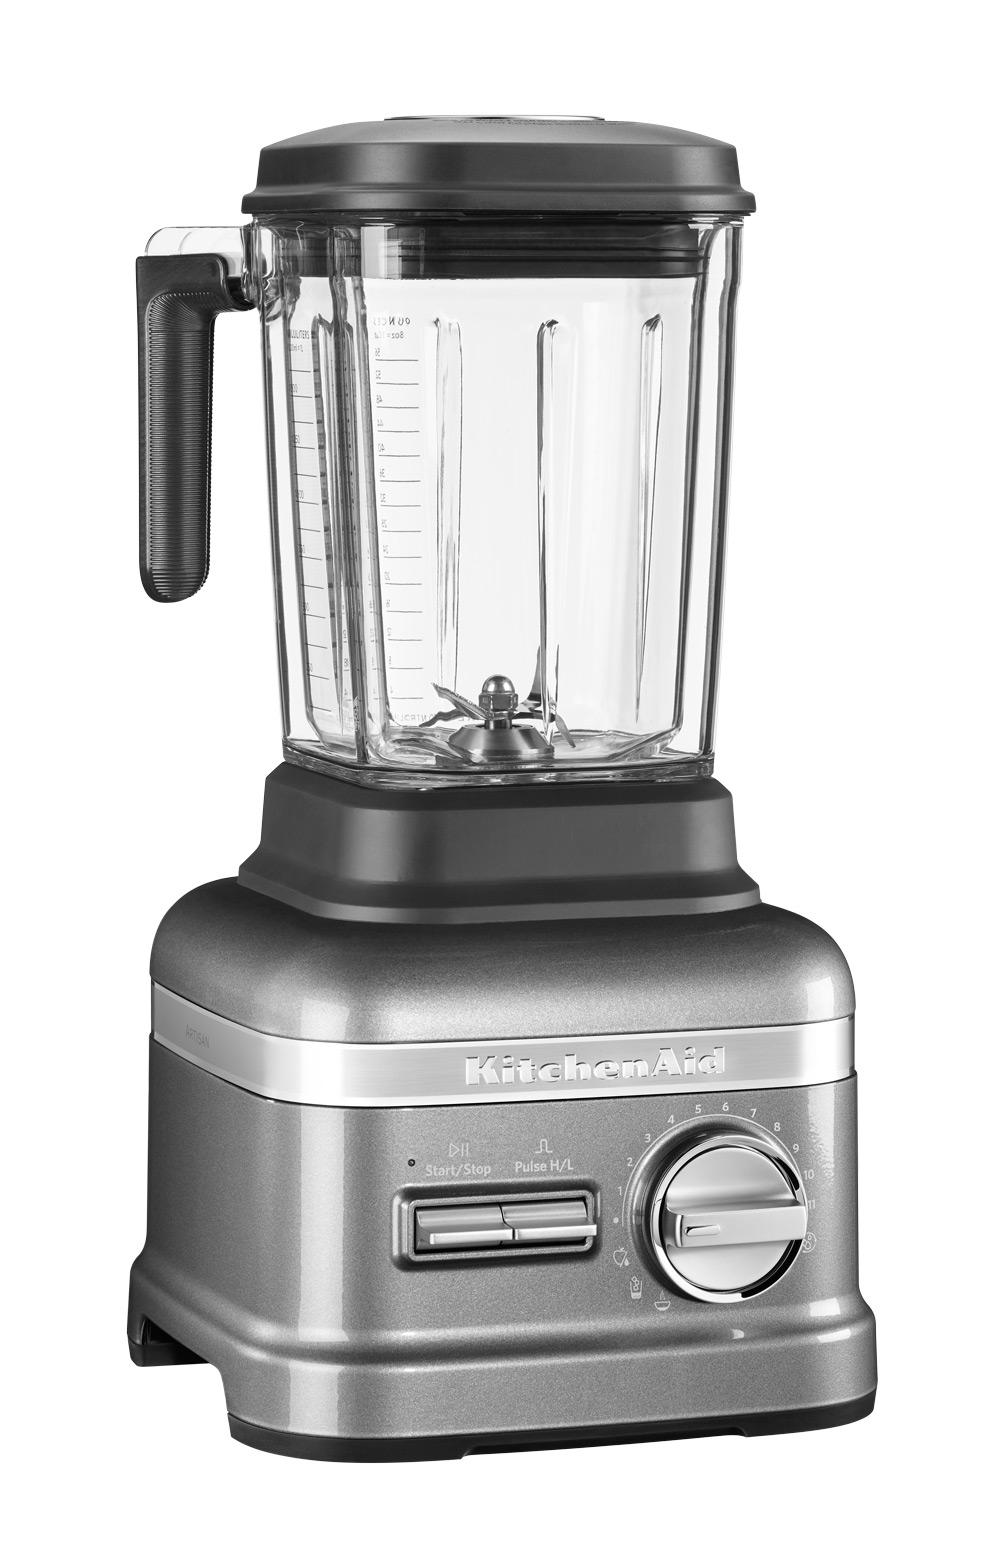 KitchenAid Power Plus Blender Silver